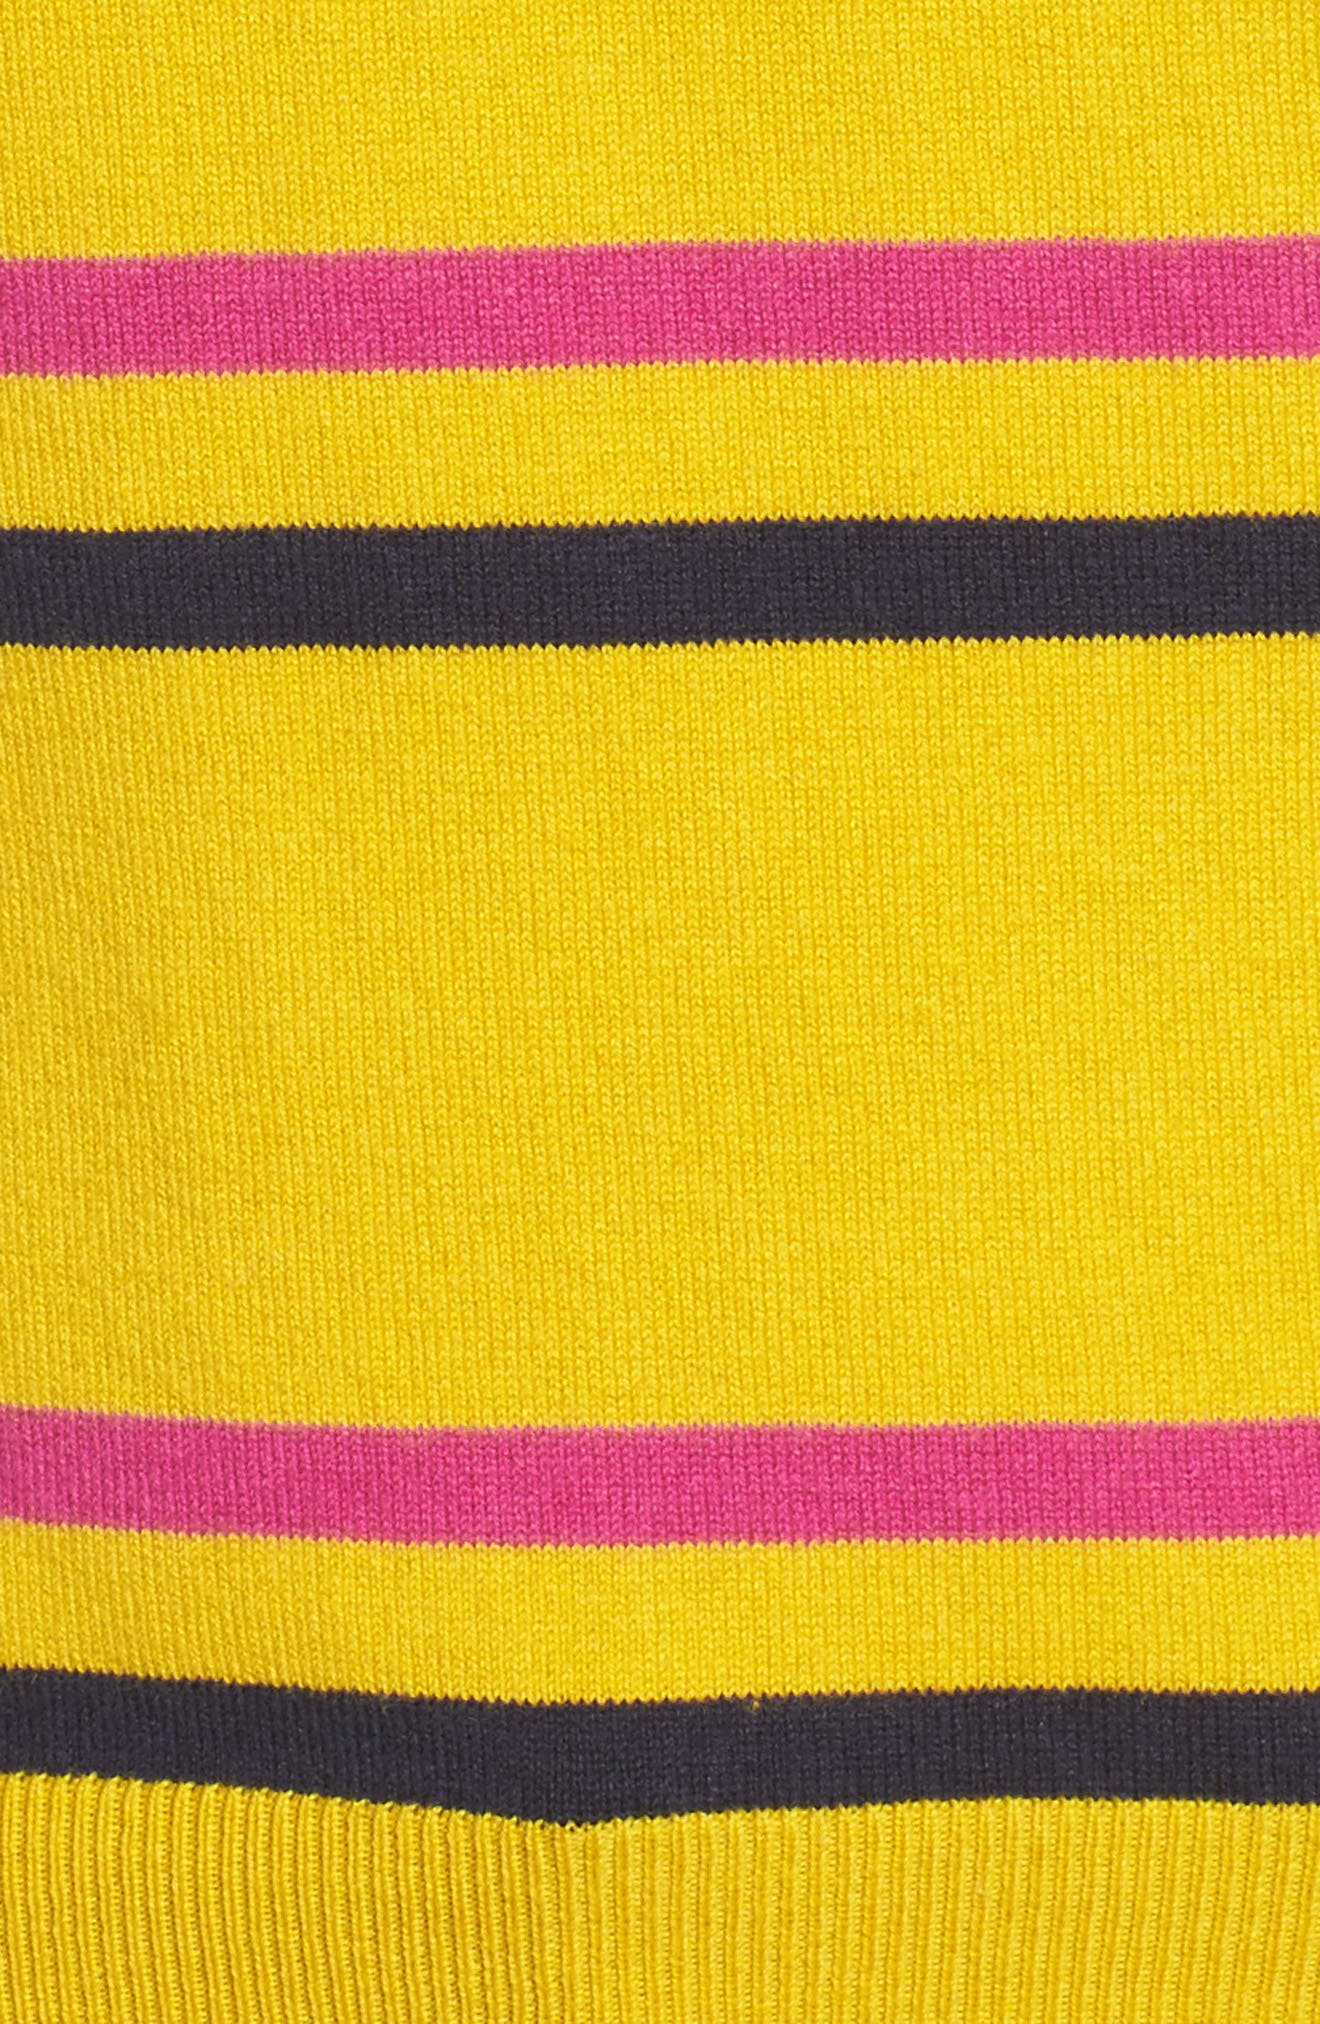 Ruffle Yoke Sweater,                             Alternate thumbnail 5, color,                             720